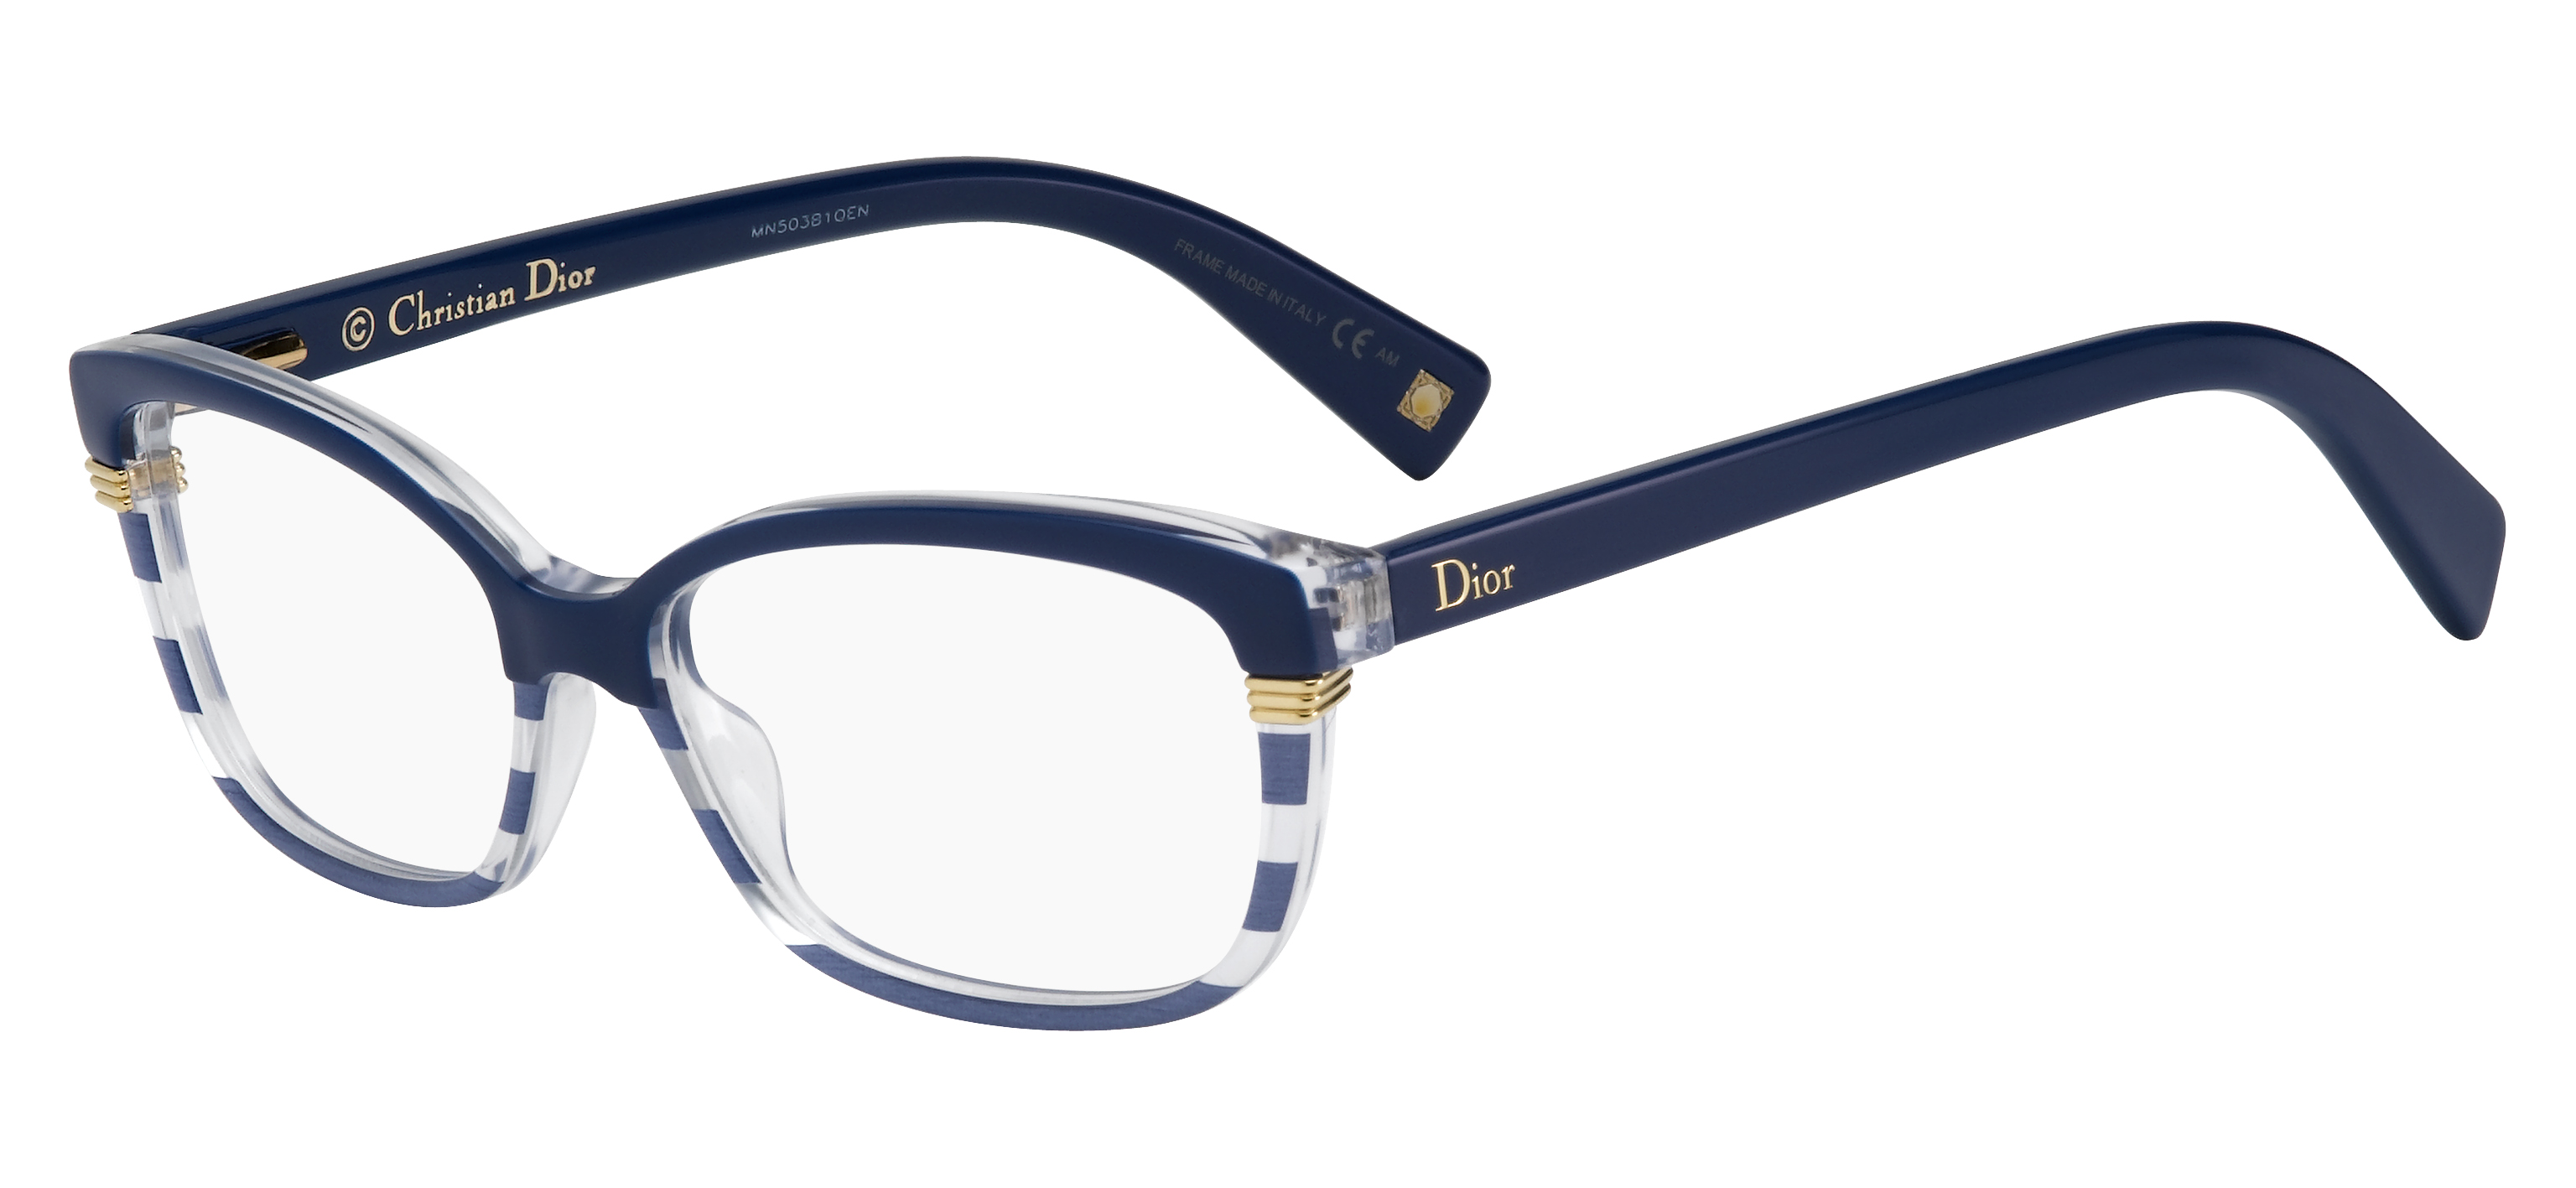 03e1cf3389 Γυαλιά ηλίου Crpoisette Dior! Δες τη νέα συλλογή.. - TLIFE